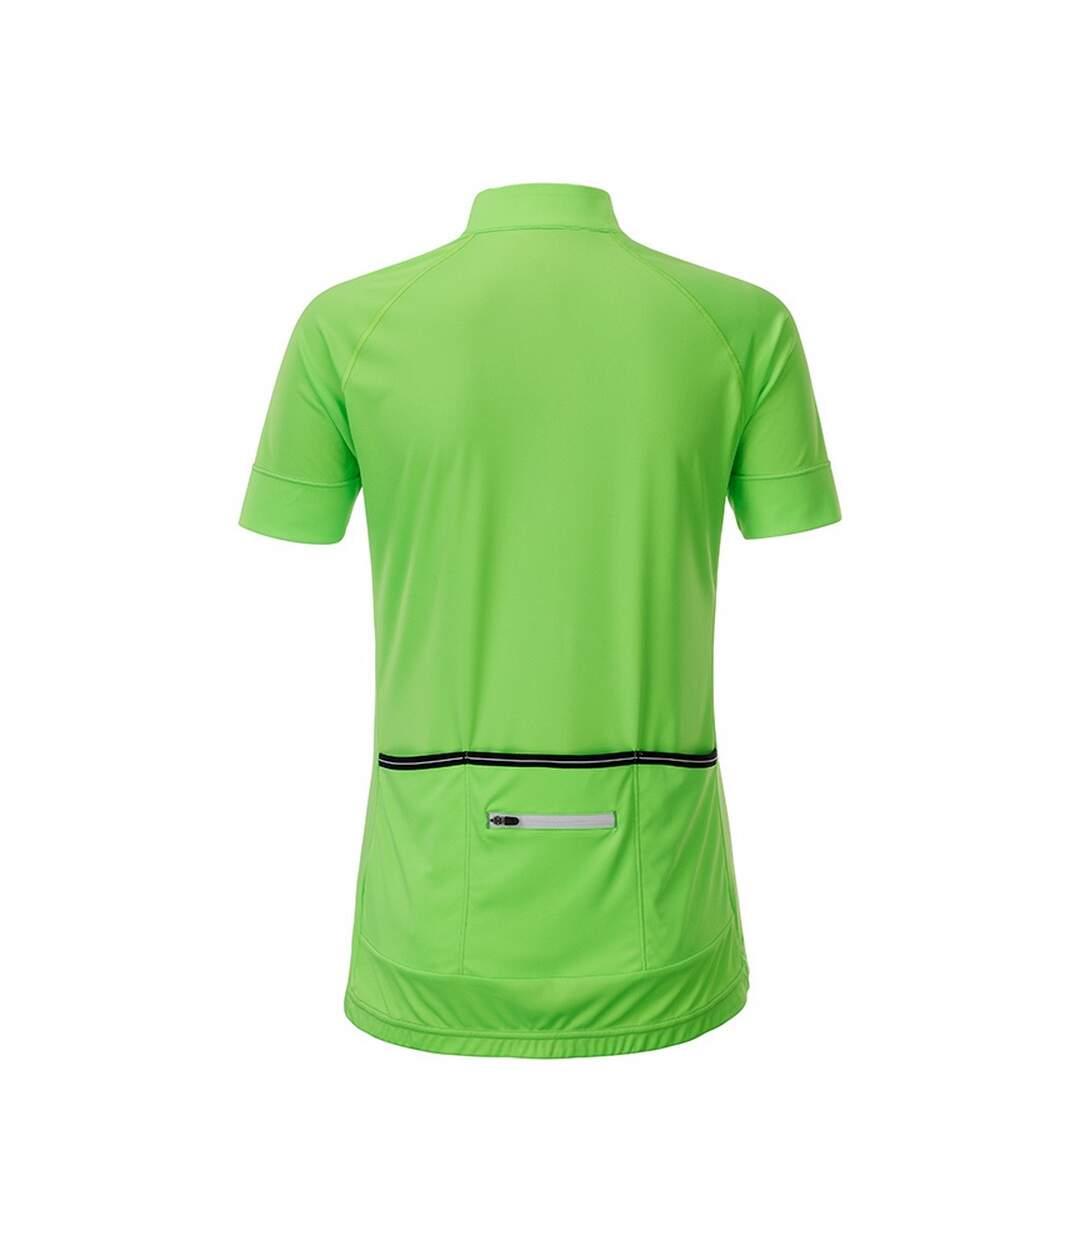 James And Nicholson - T-Shirt Zippé - Femme (Vert vif / blanc) - UTFU166